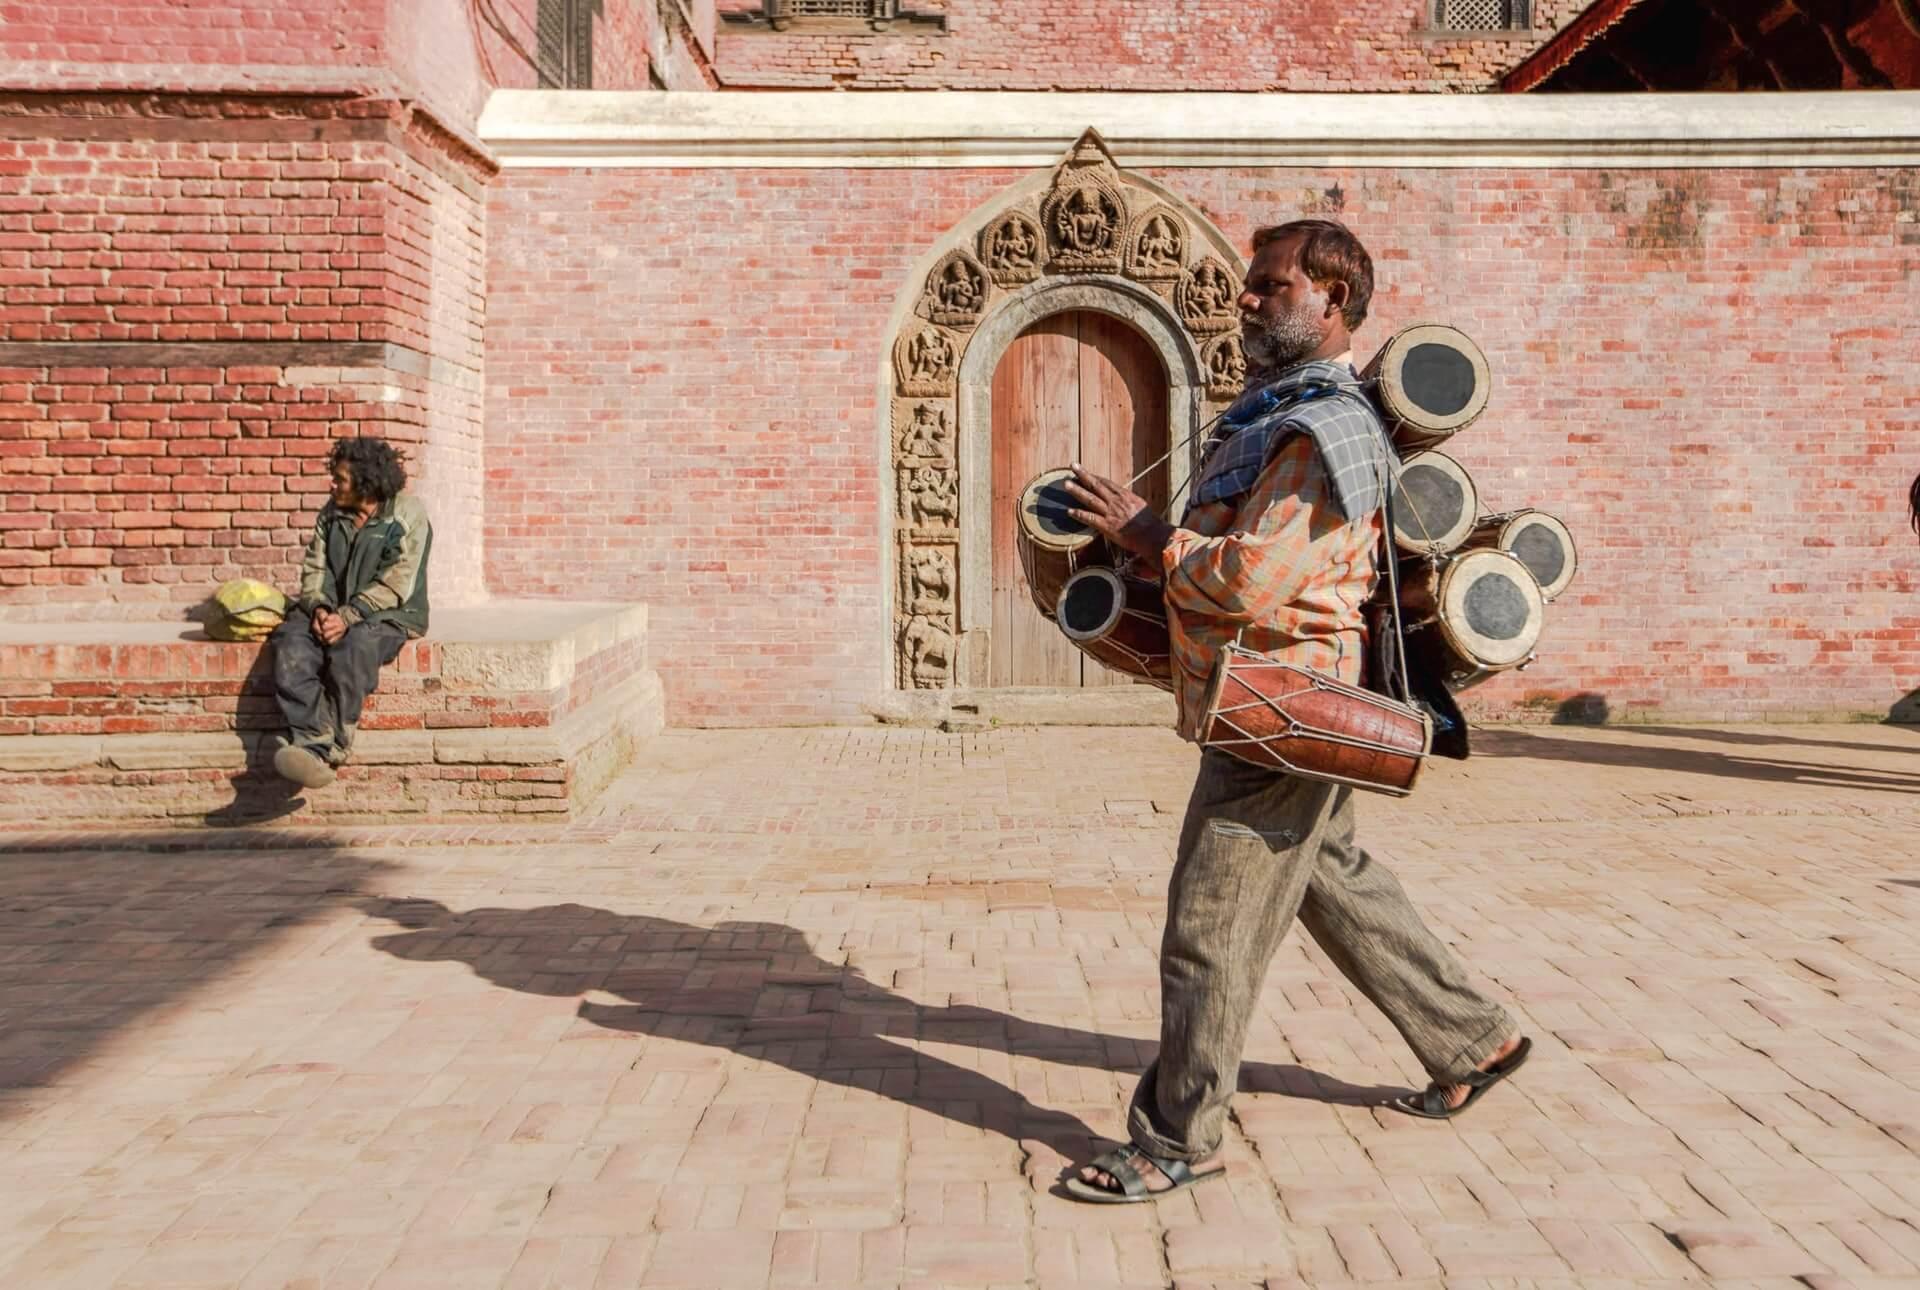 Drum merchant seen in a market while shopping in Kathmandu, Nepal